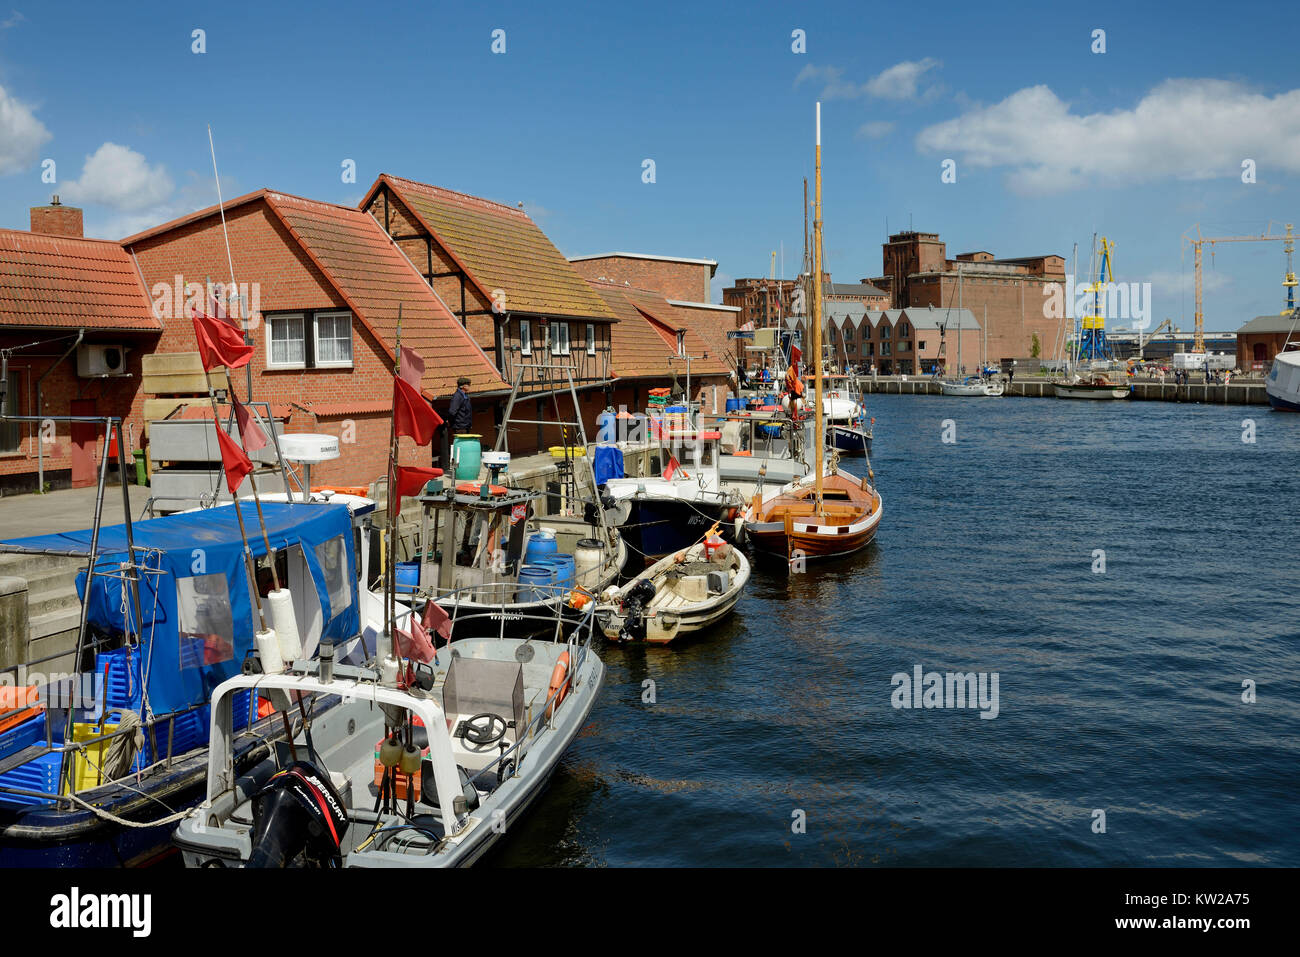 Wismar, fishing boats in the old harbour, Fischerboote im Alten Hafen - Stock Image